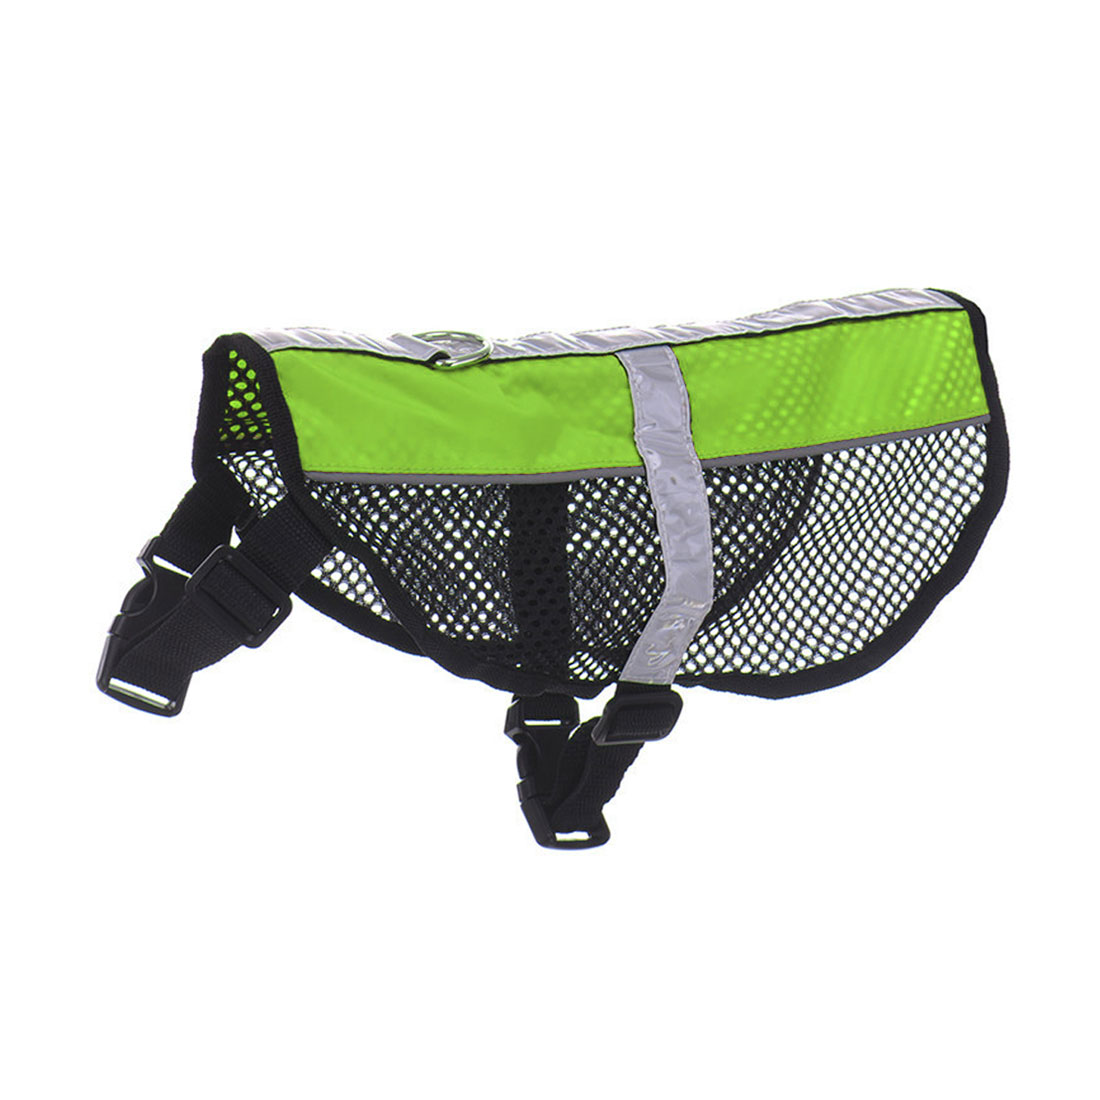 Service Dog Mesh Vest Harness Cool Comfort Nylon High Visibility Safety Jacket Green M